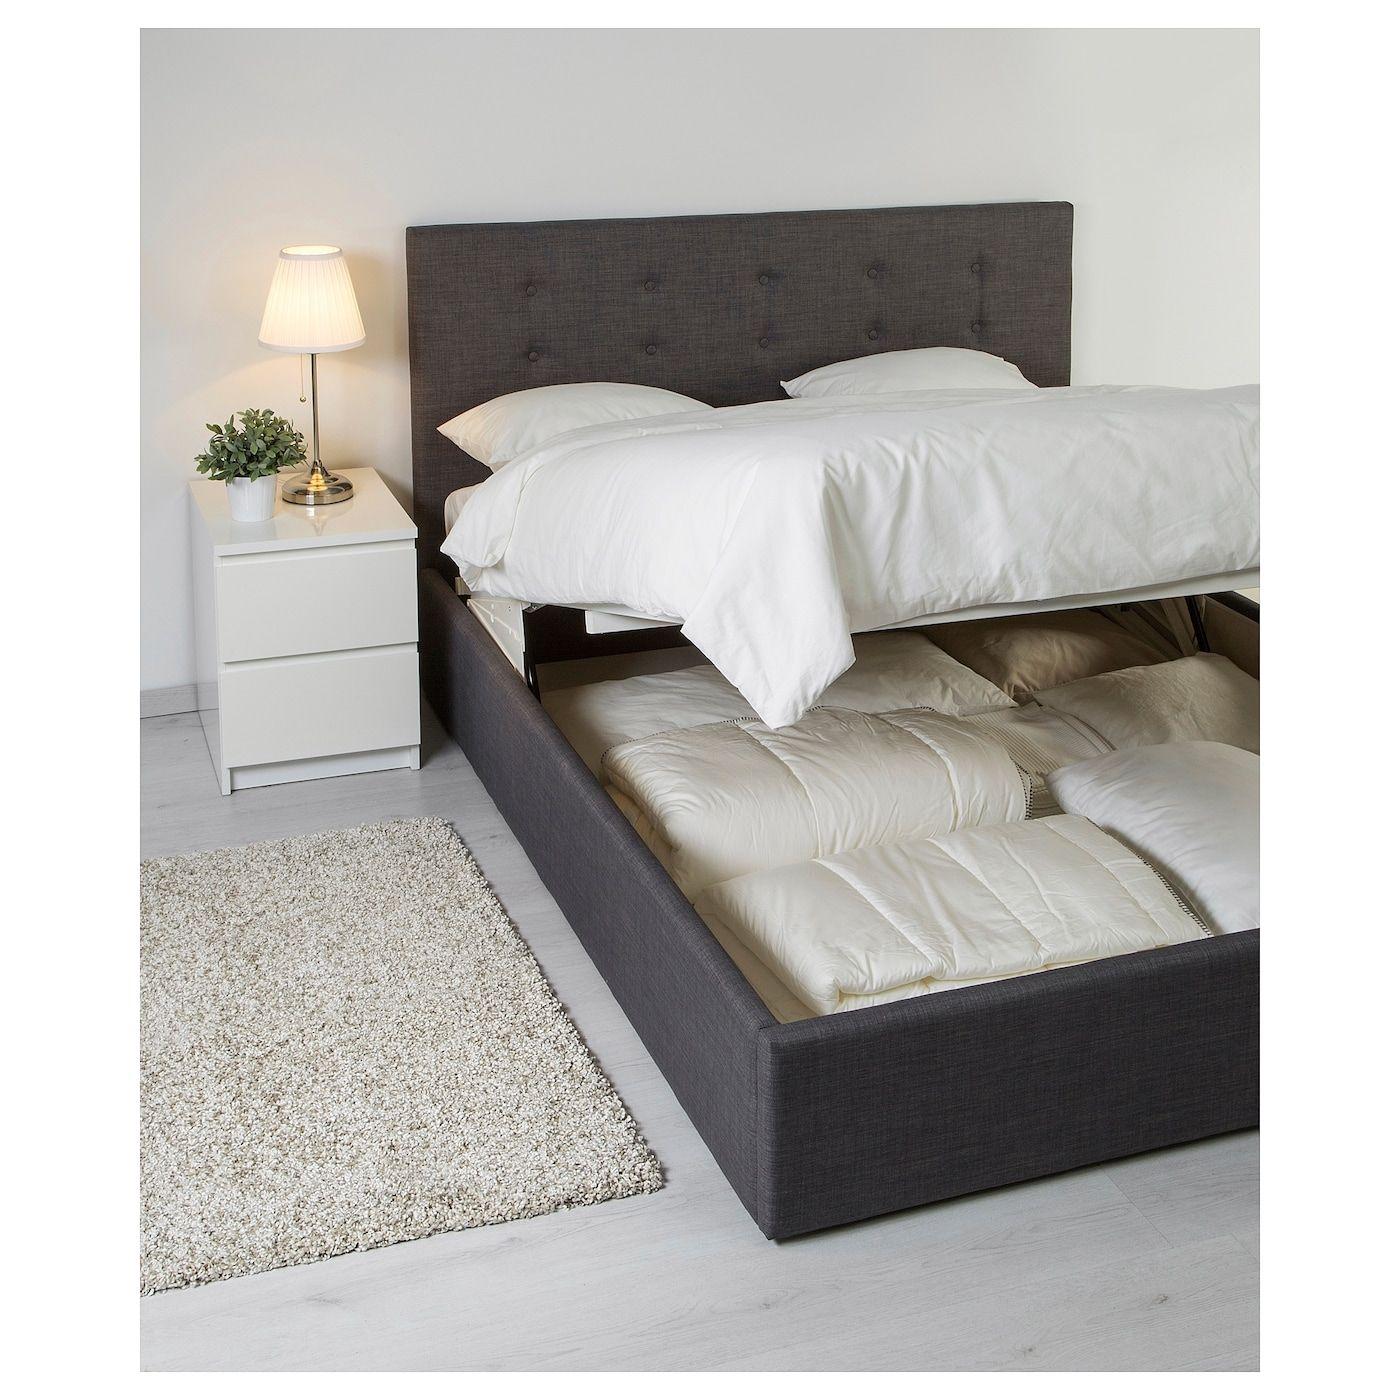 Gvarv Ottoman Bed Skiftebo Dark Grey Grey Standard King In 2020 Ottoman Bed Grey Bed Frame Bed Frame With Storage